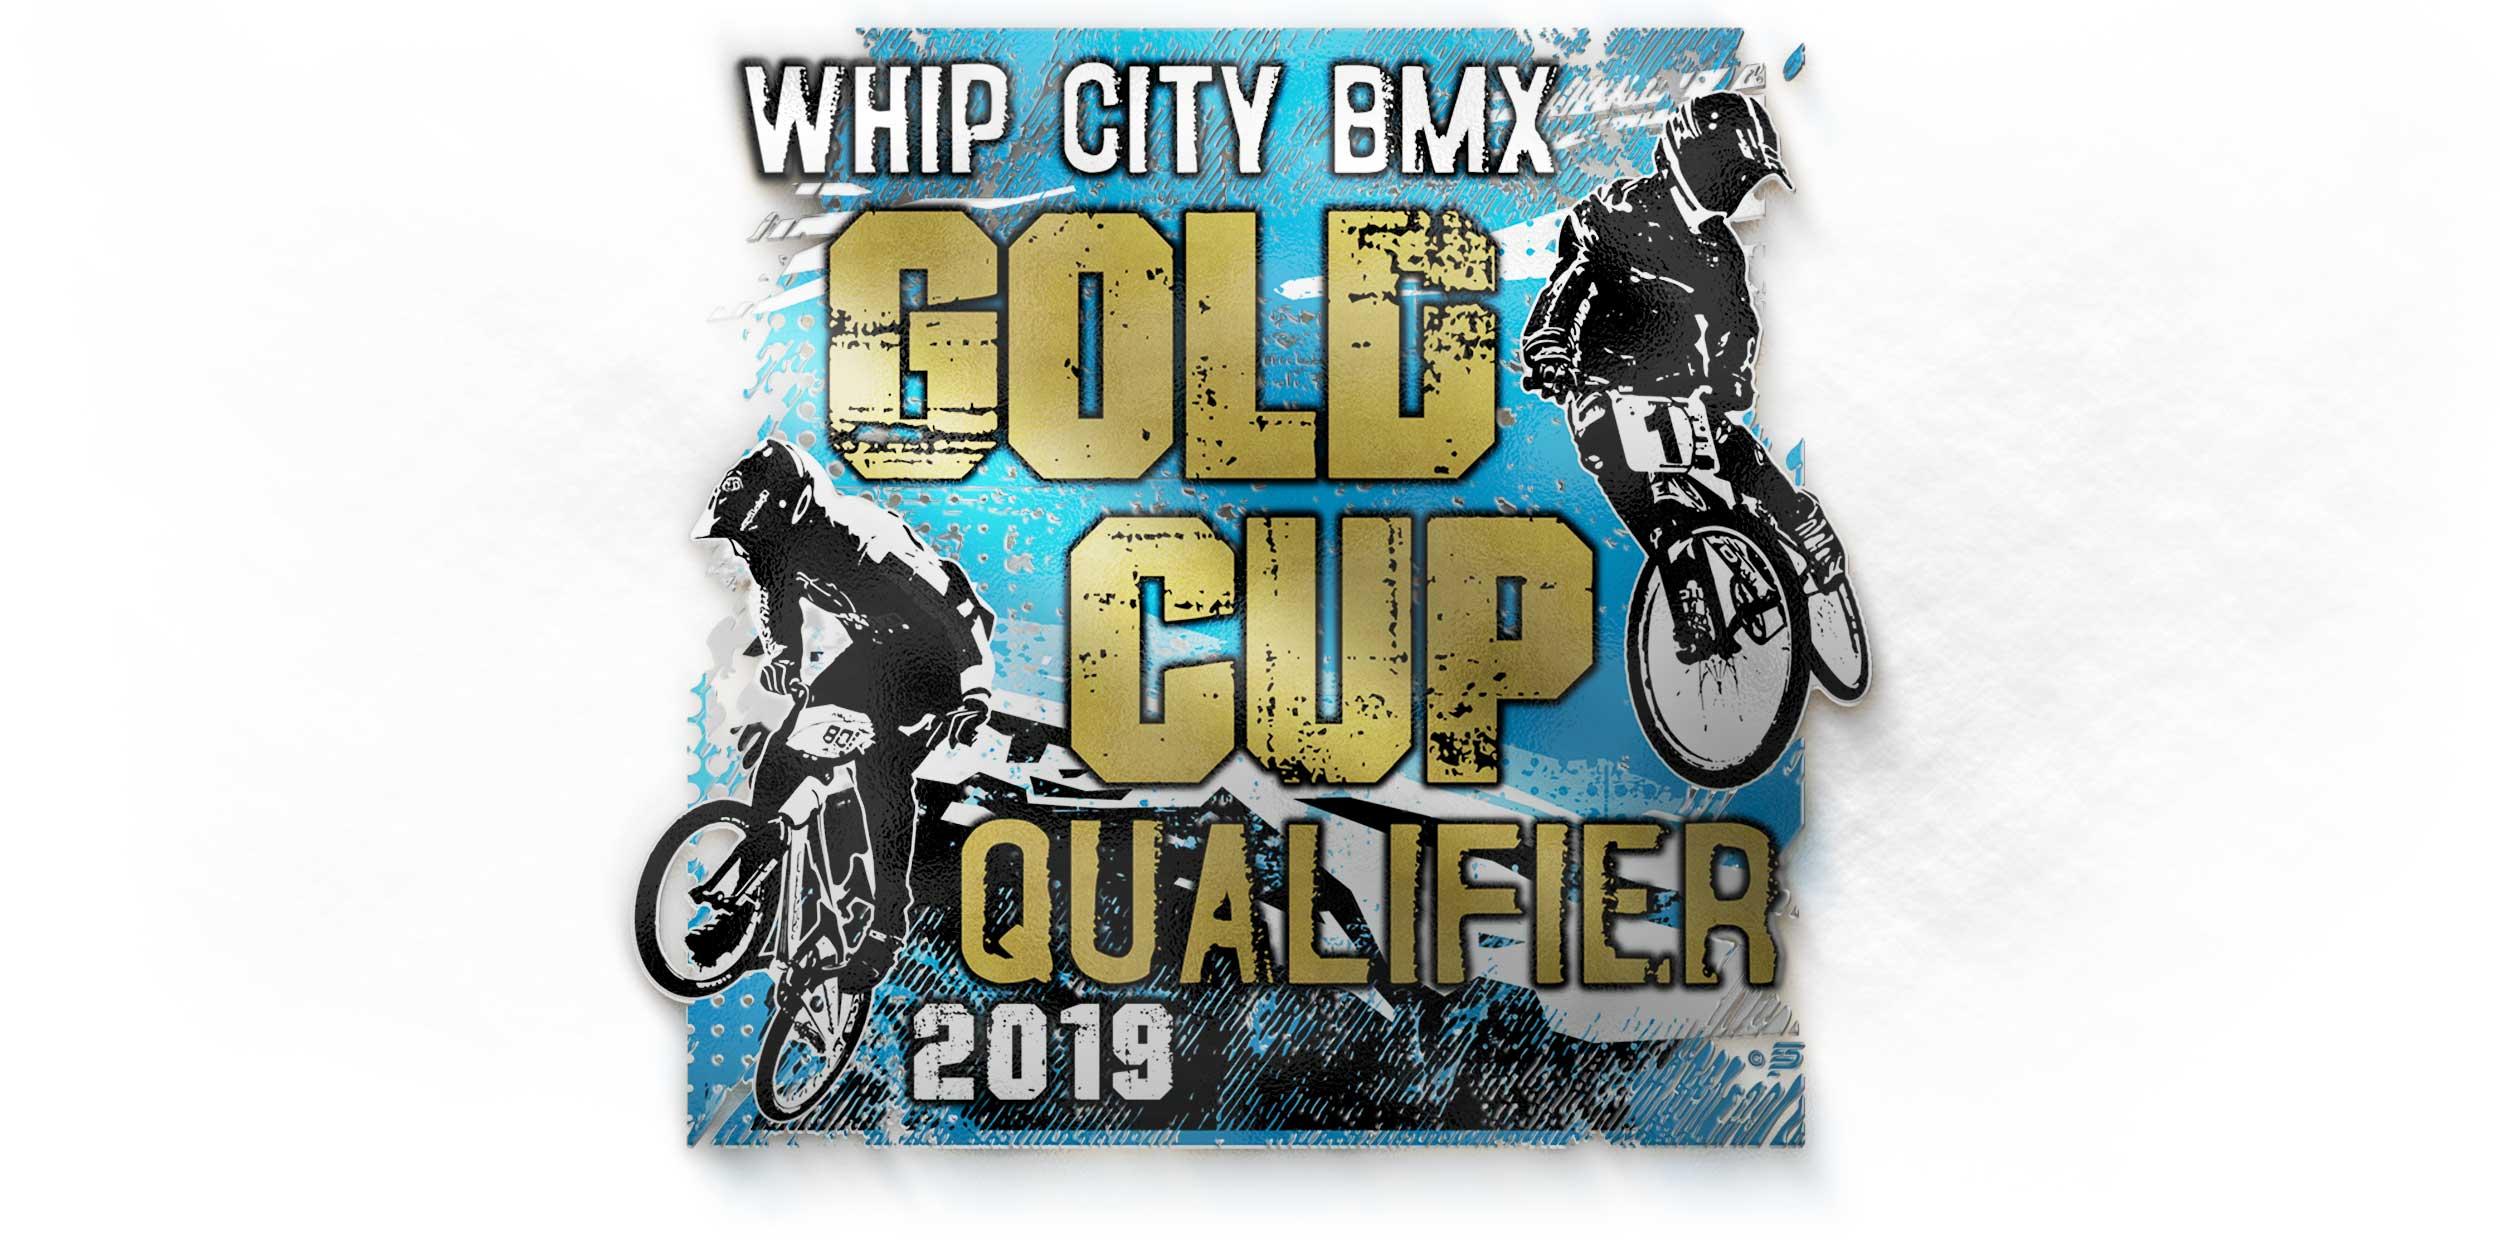 BMX-Gold-Cup-Qualifier-fine-Designs-Apparel